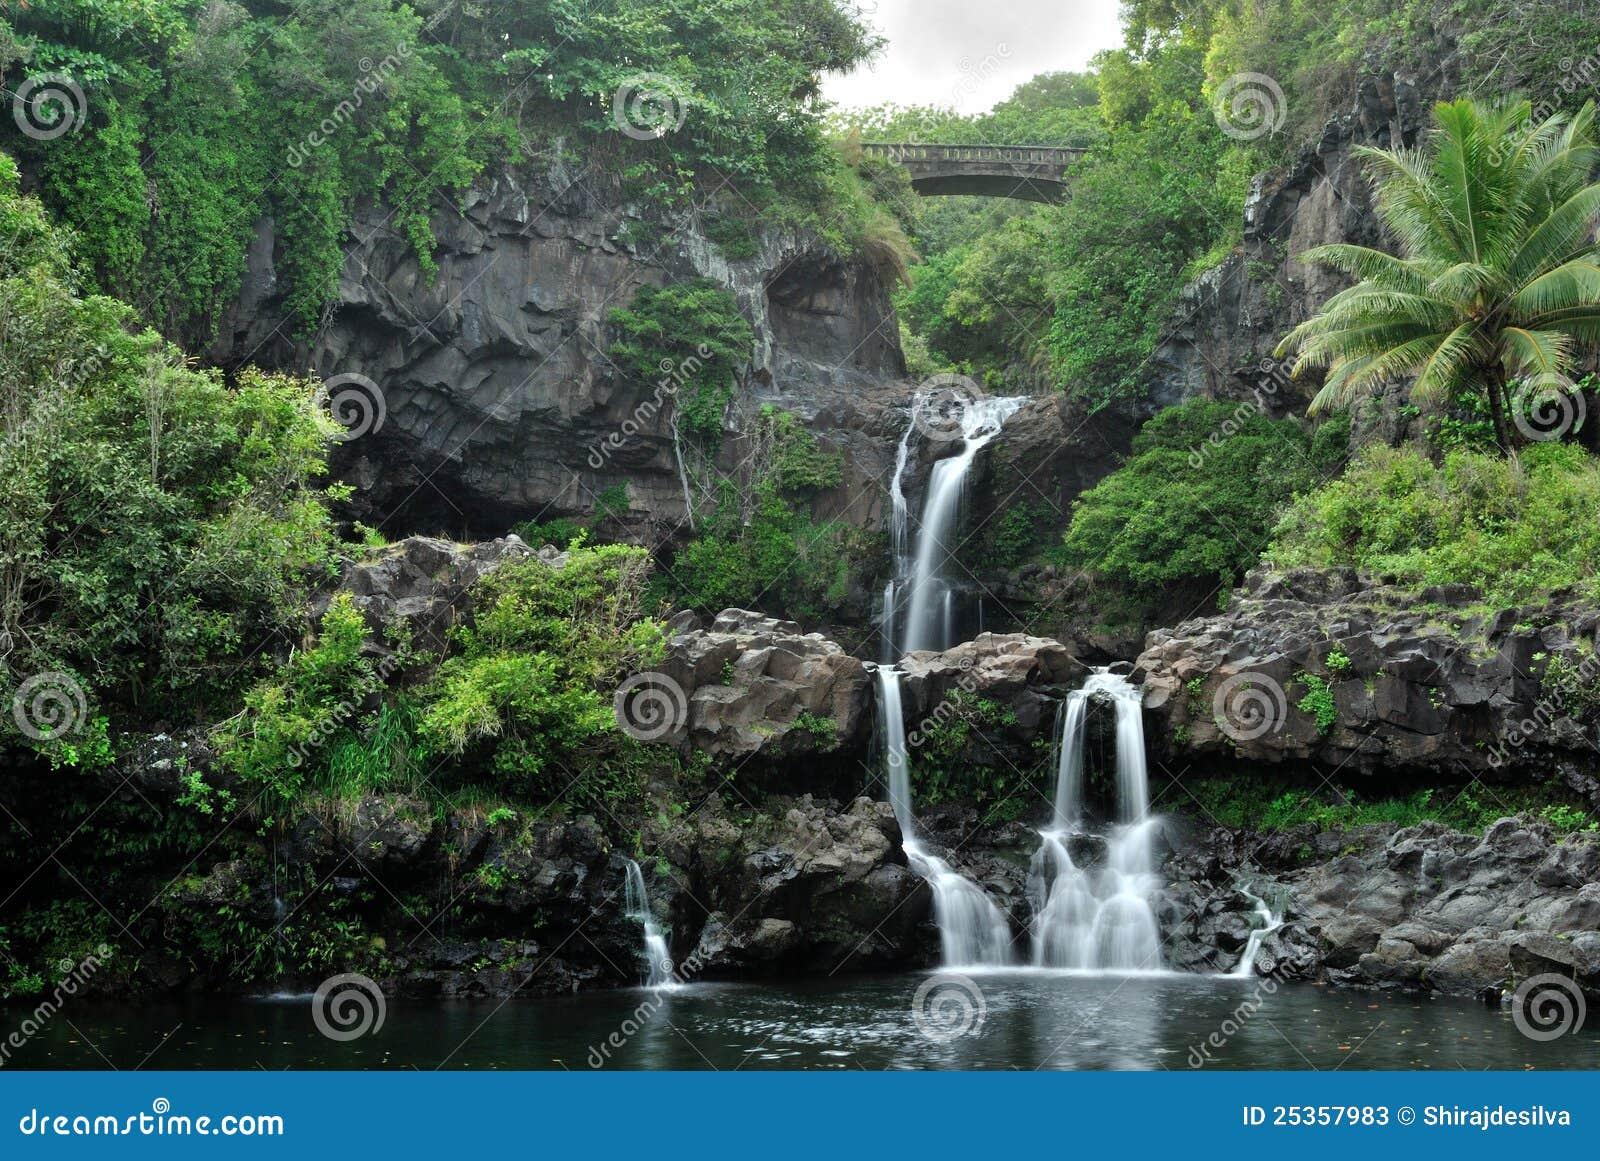 Seven Sacred Pools of Ohio, Maui, Hawaii